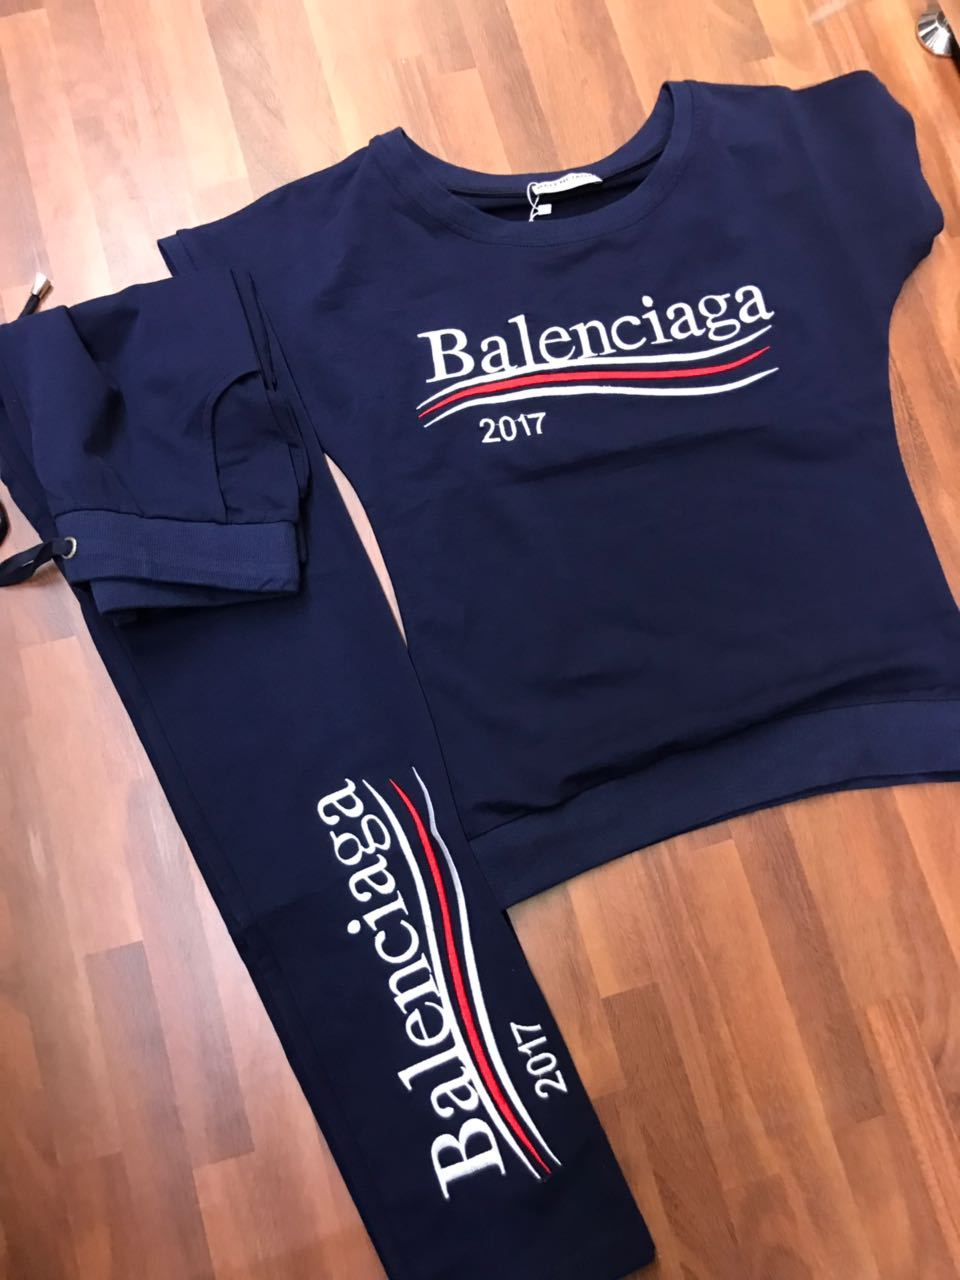 Balenciaga Women Clothes Dark Blue Color , Red & White Line.